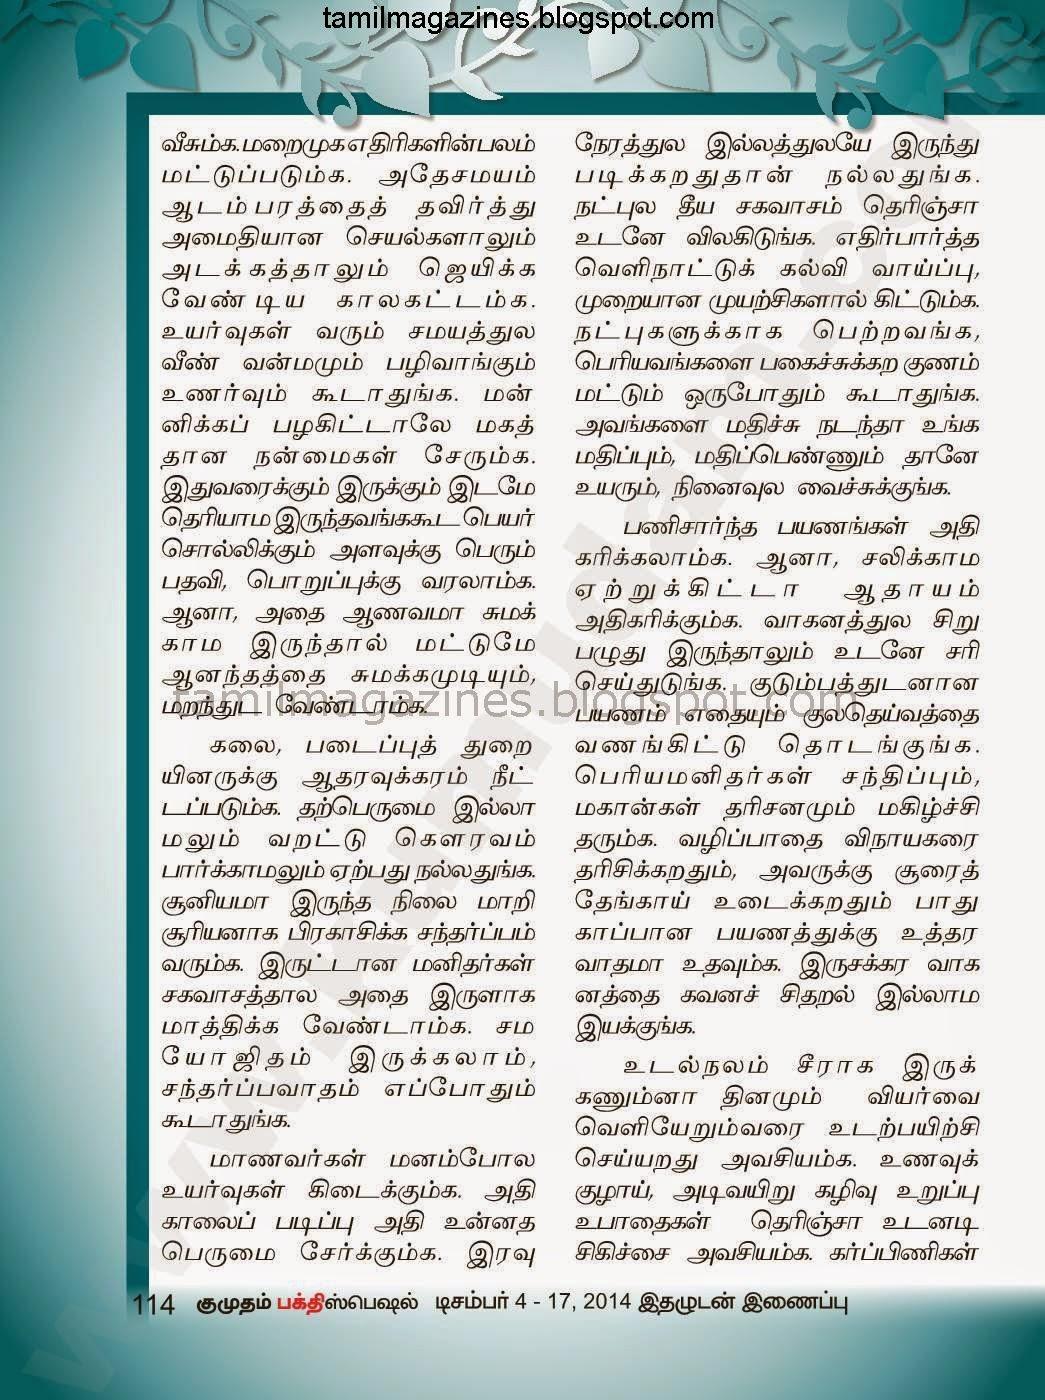 Tamil puthandu rasi palan 2013 tamil new year rasi palan html autos weblog Home palan